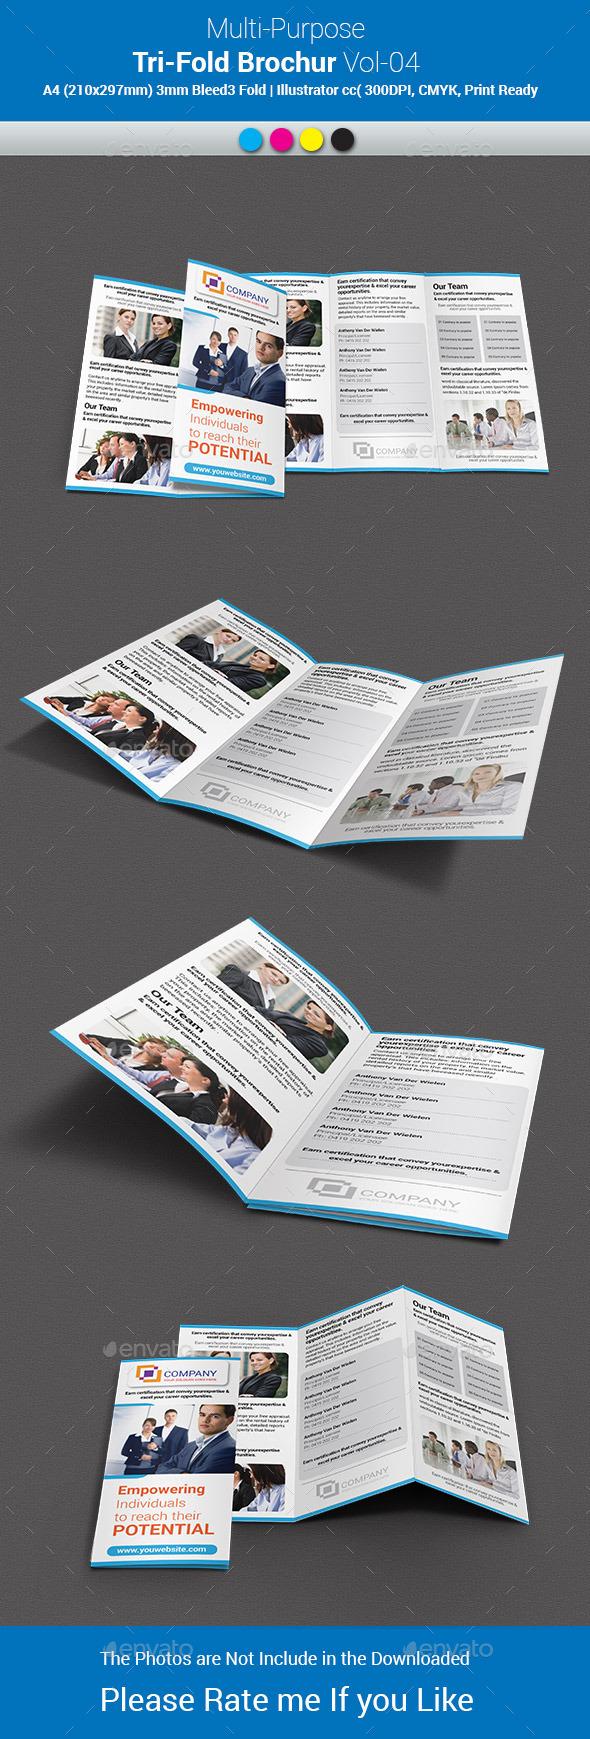 Multipurpose Business Tri-Fold Brochure Vol-04 - Corporate Brochures